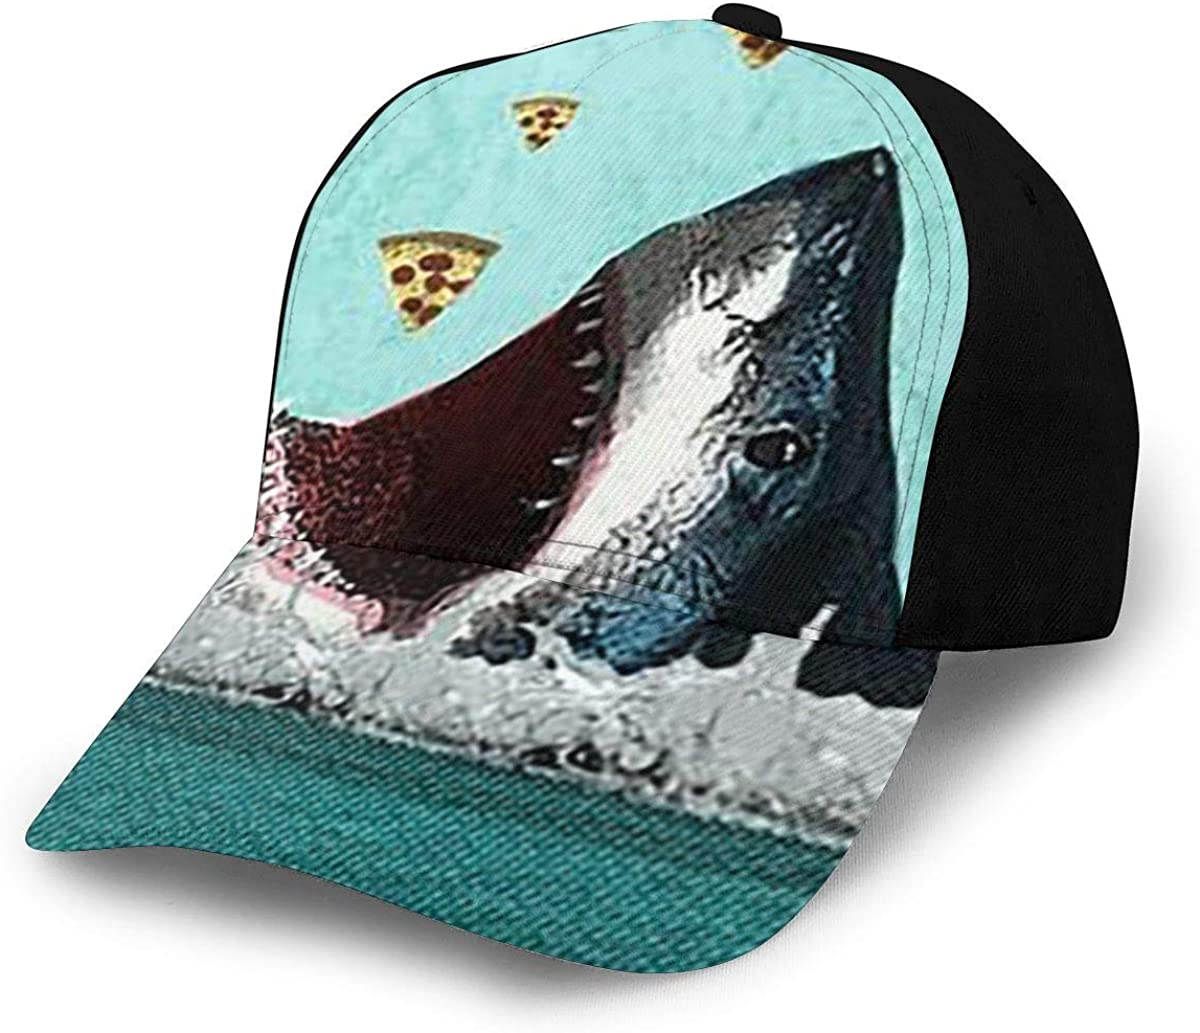 Baseball Caps Cartoon Shark Receive Baseball Caps Snapback Dad Fishing Cap Hat Adjustable